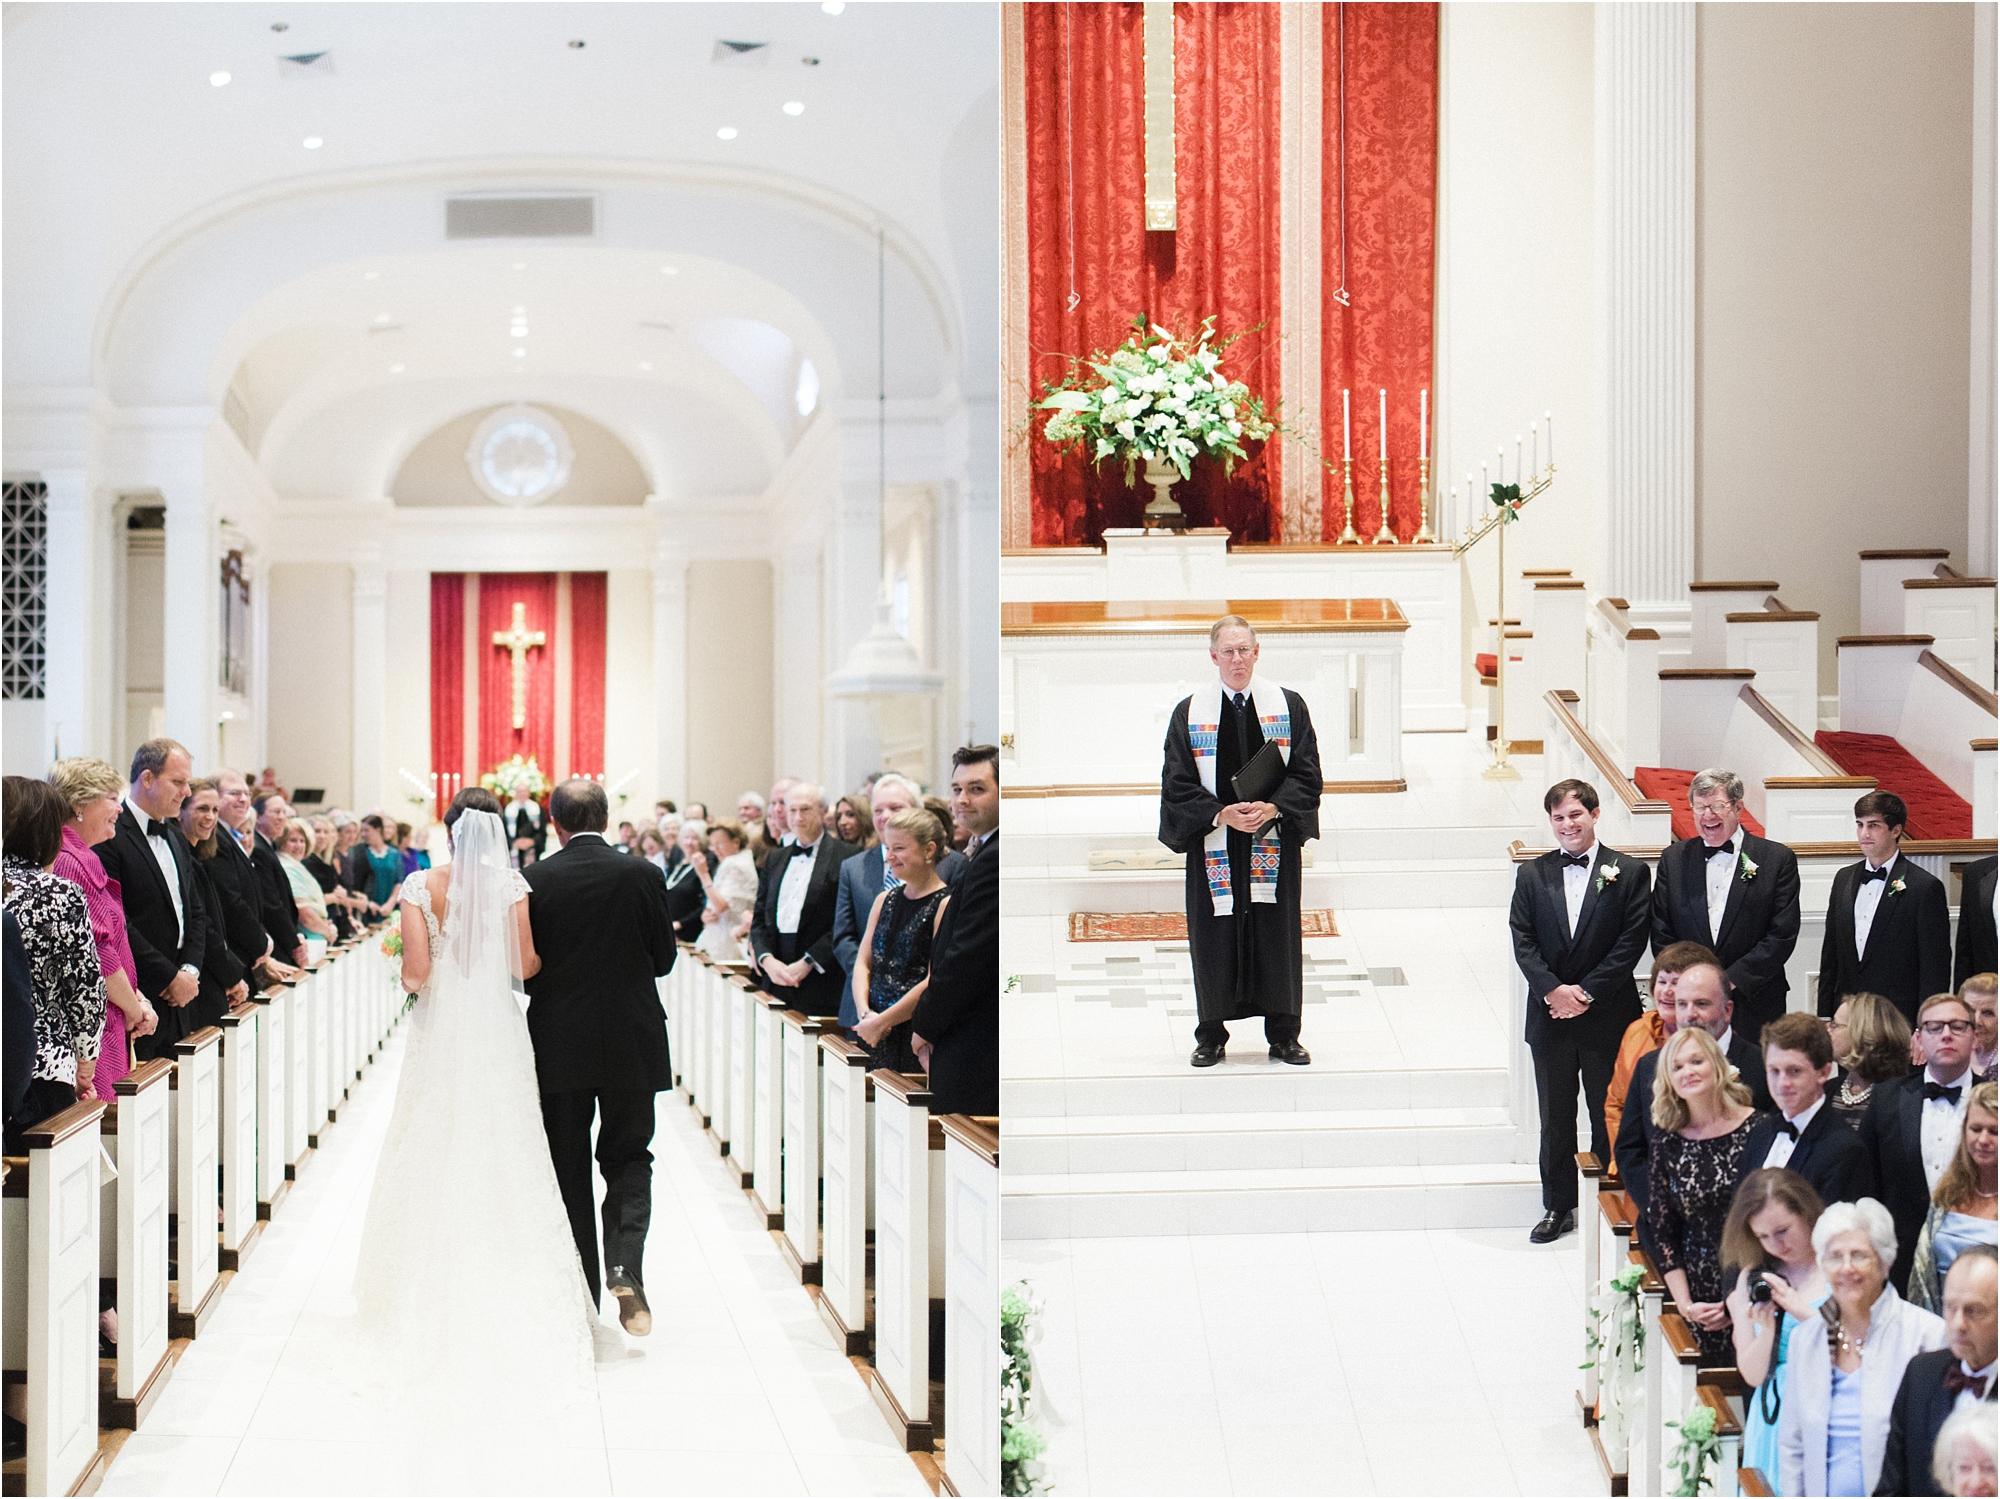 stephanie-yonce-photography-richmond-virginia-country-club-wedding-photo_024.JPG